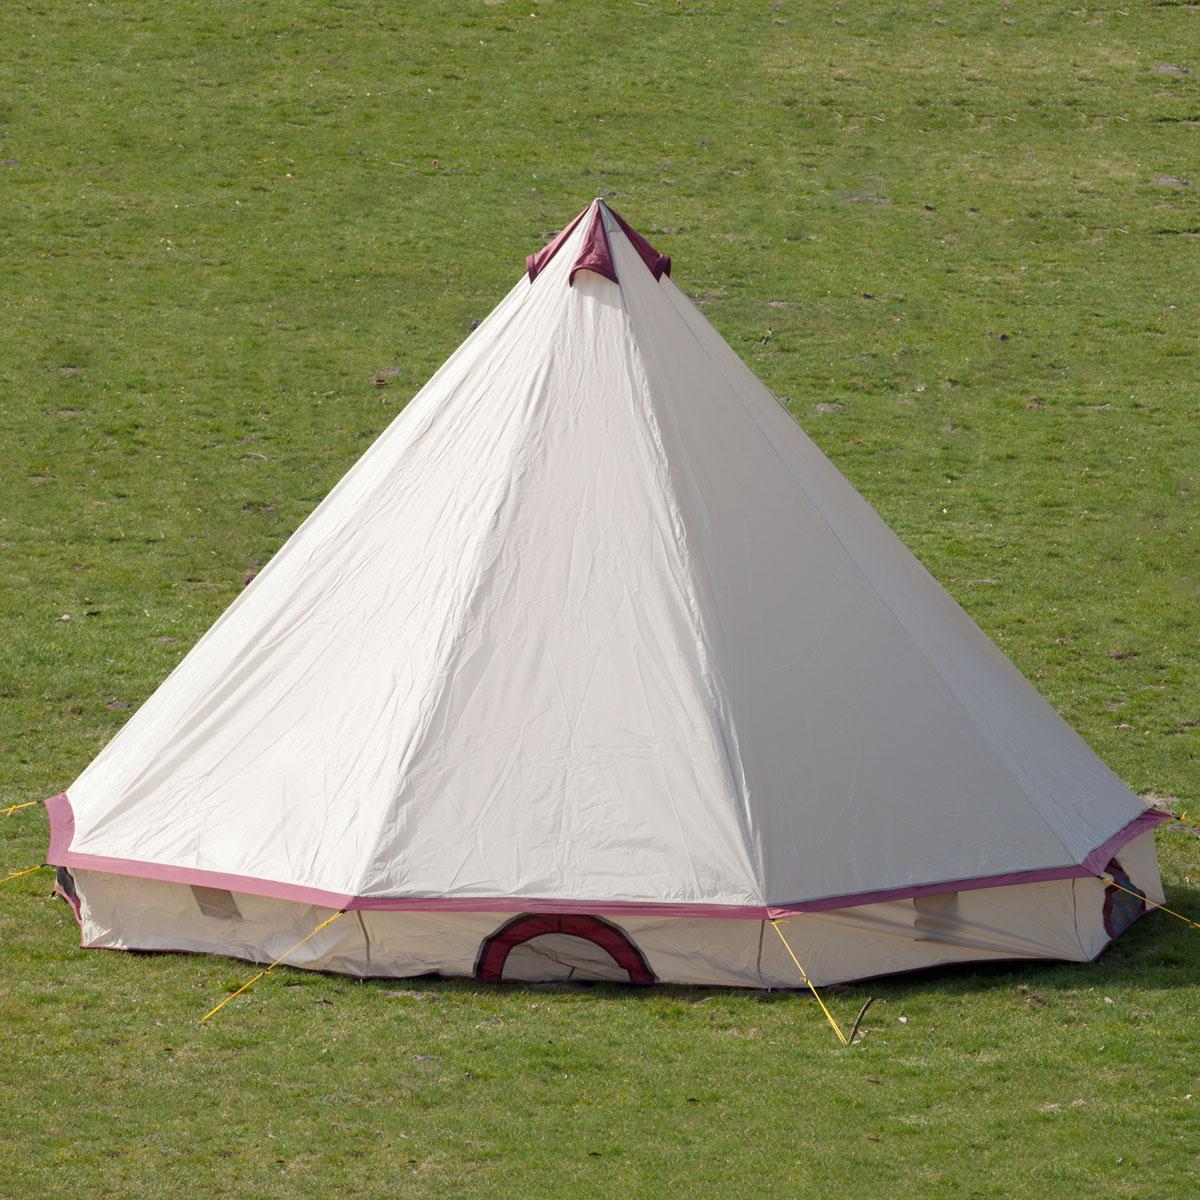 skandika comanche tente tipi indien camping 8 eprsonnes neuf ebay. Black Bedroom Furniture Sets. Home Design Ideas